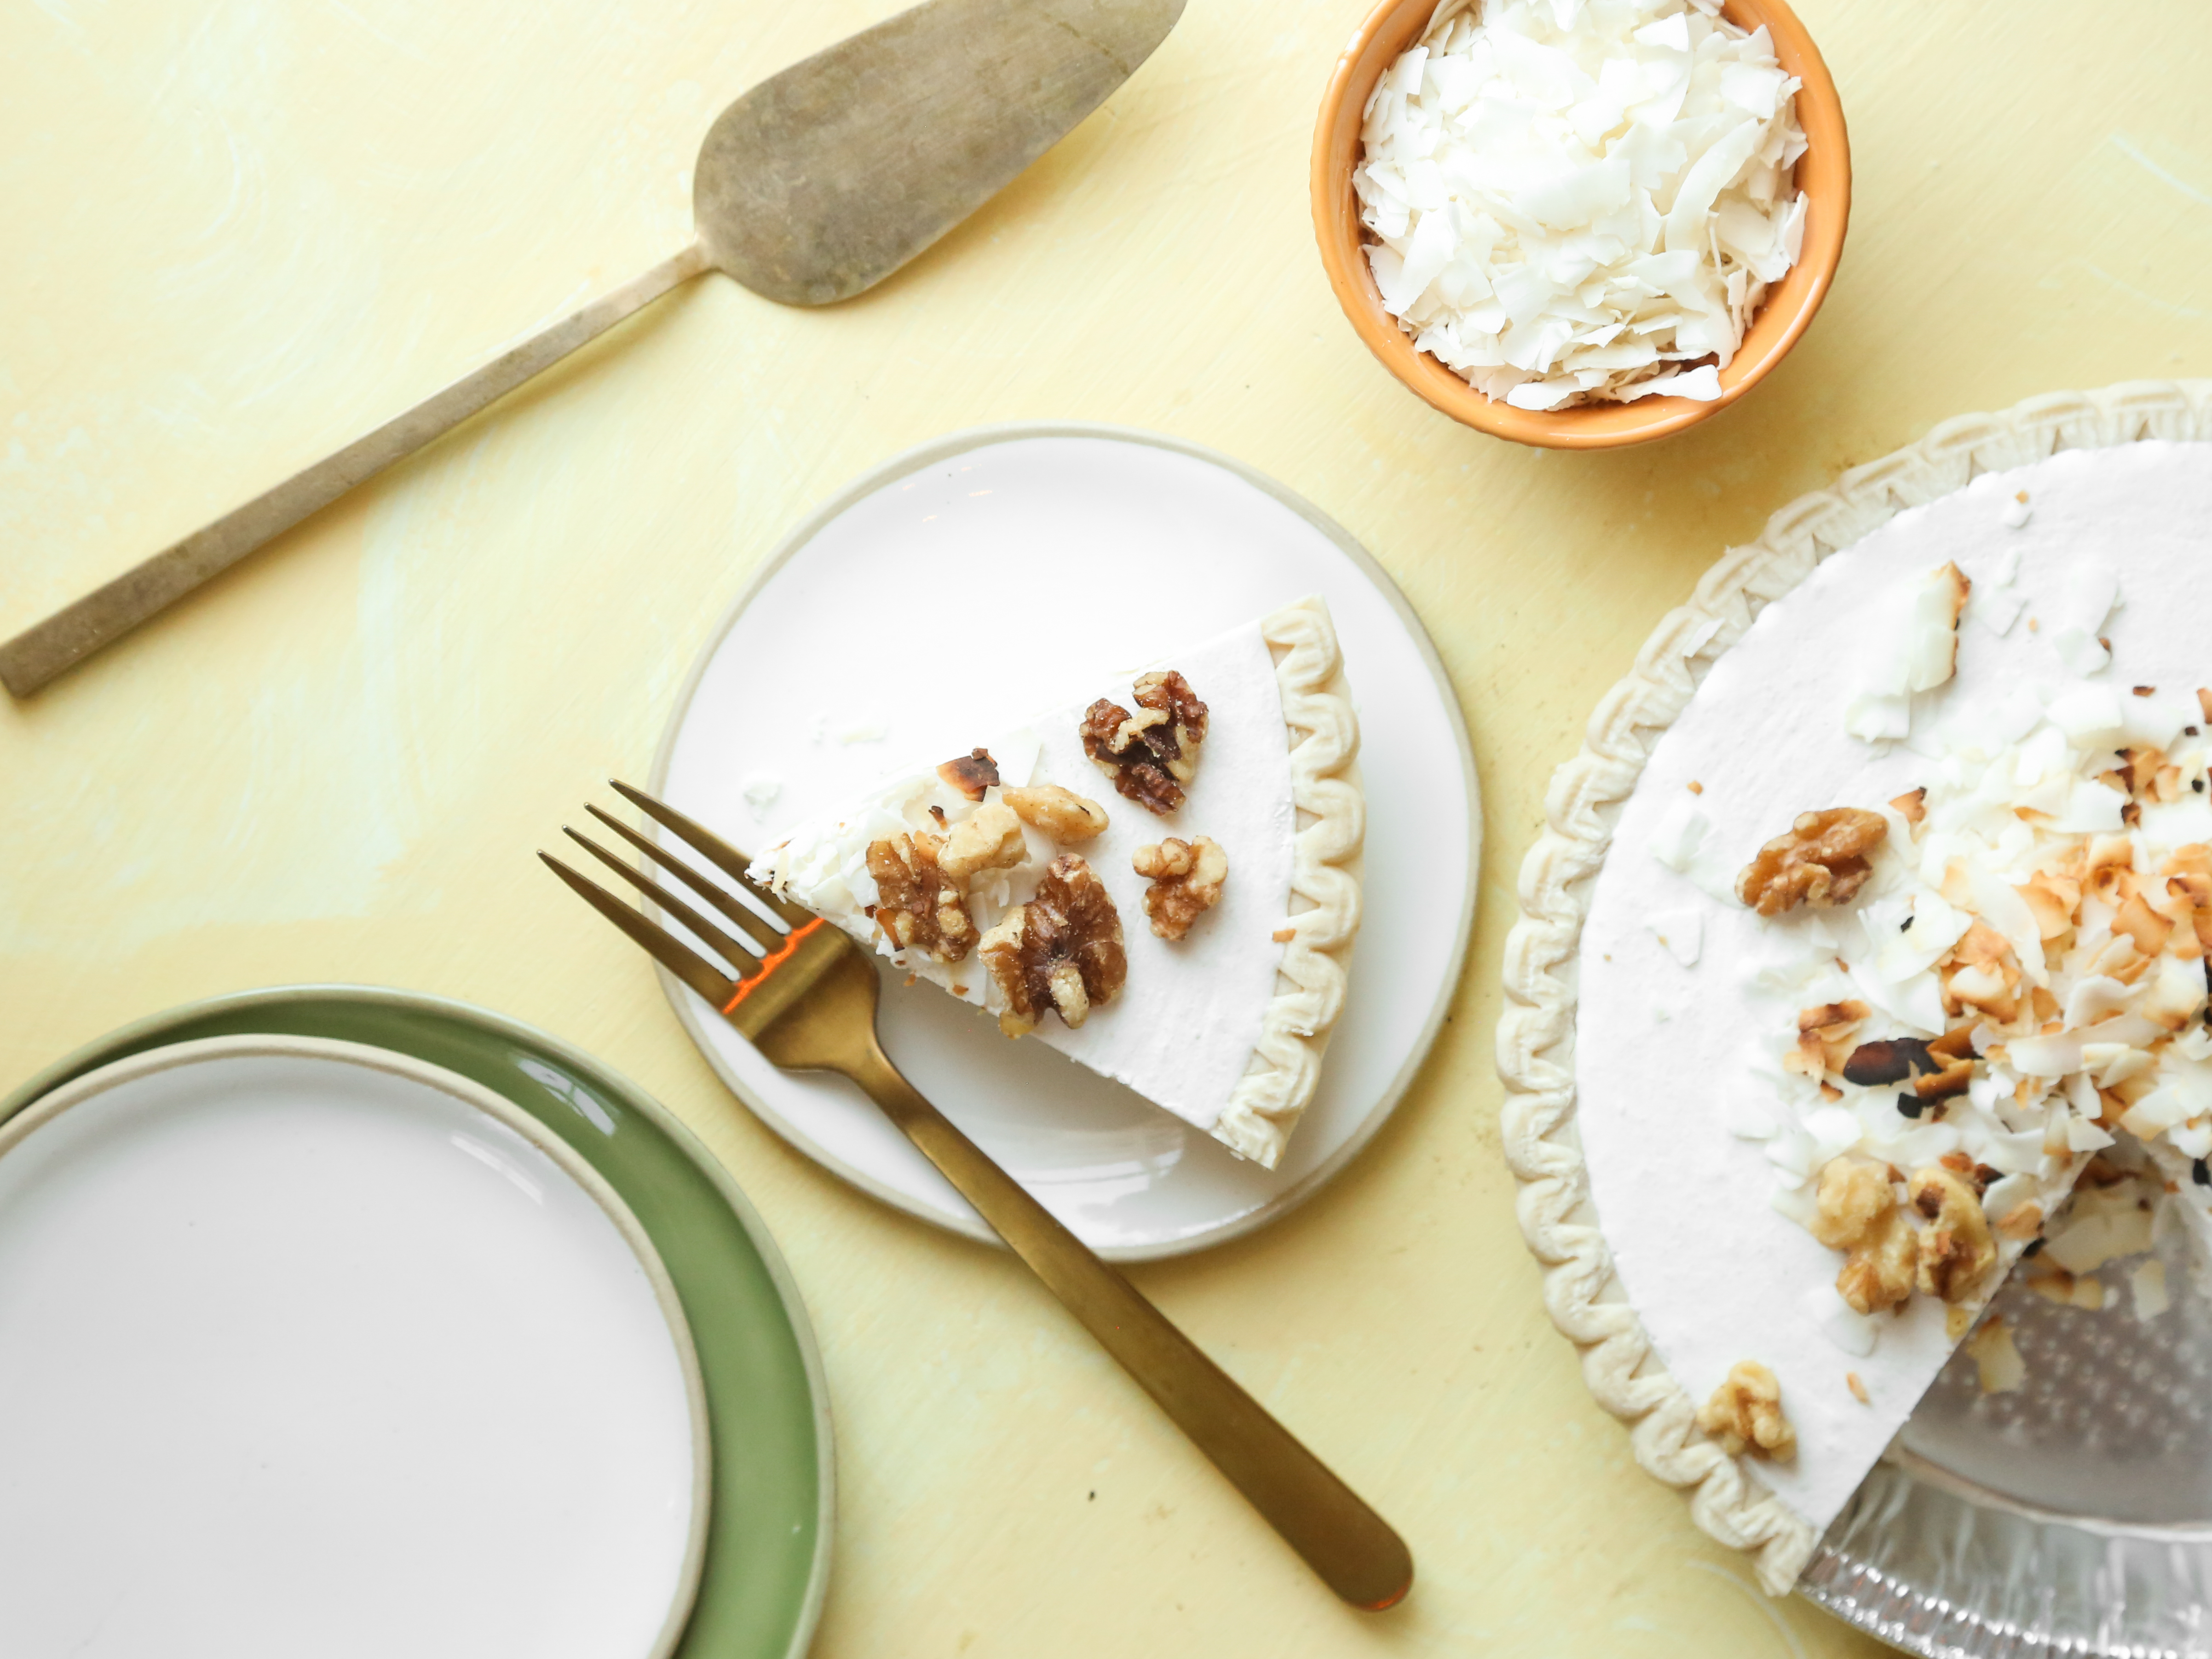 25 Easy Thanksgiving Pie Recipes And Ideas - Genius Kitchen